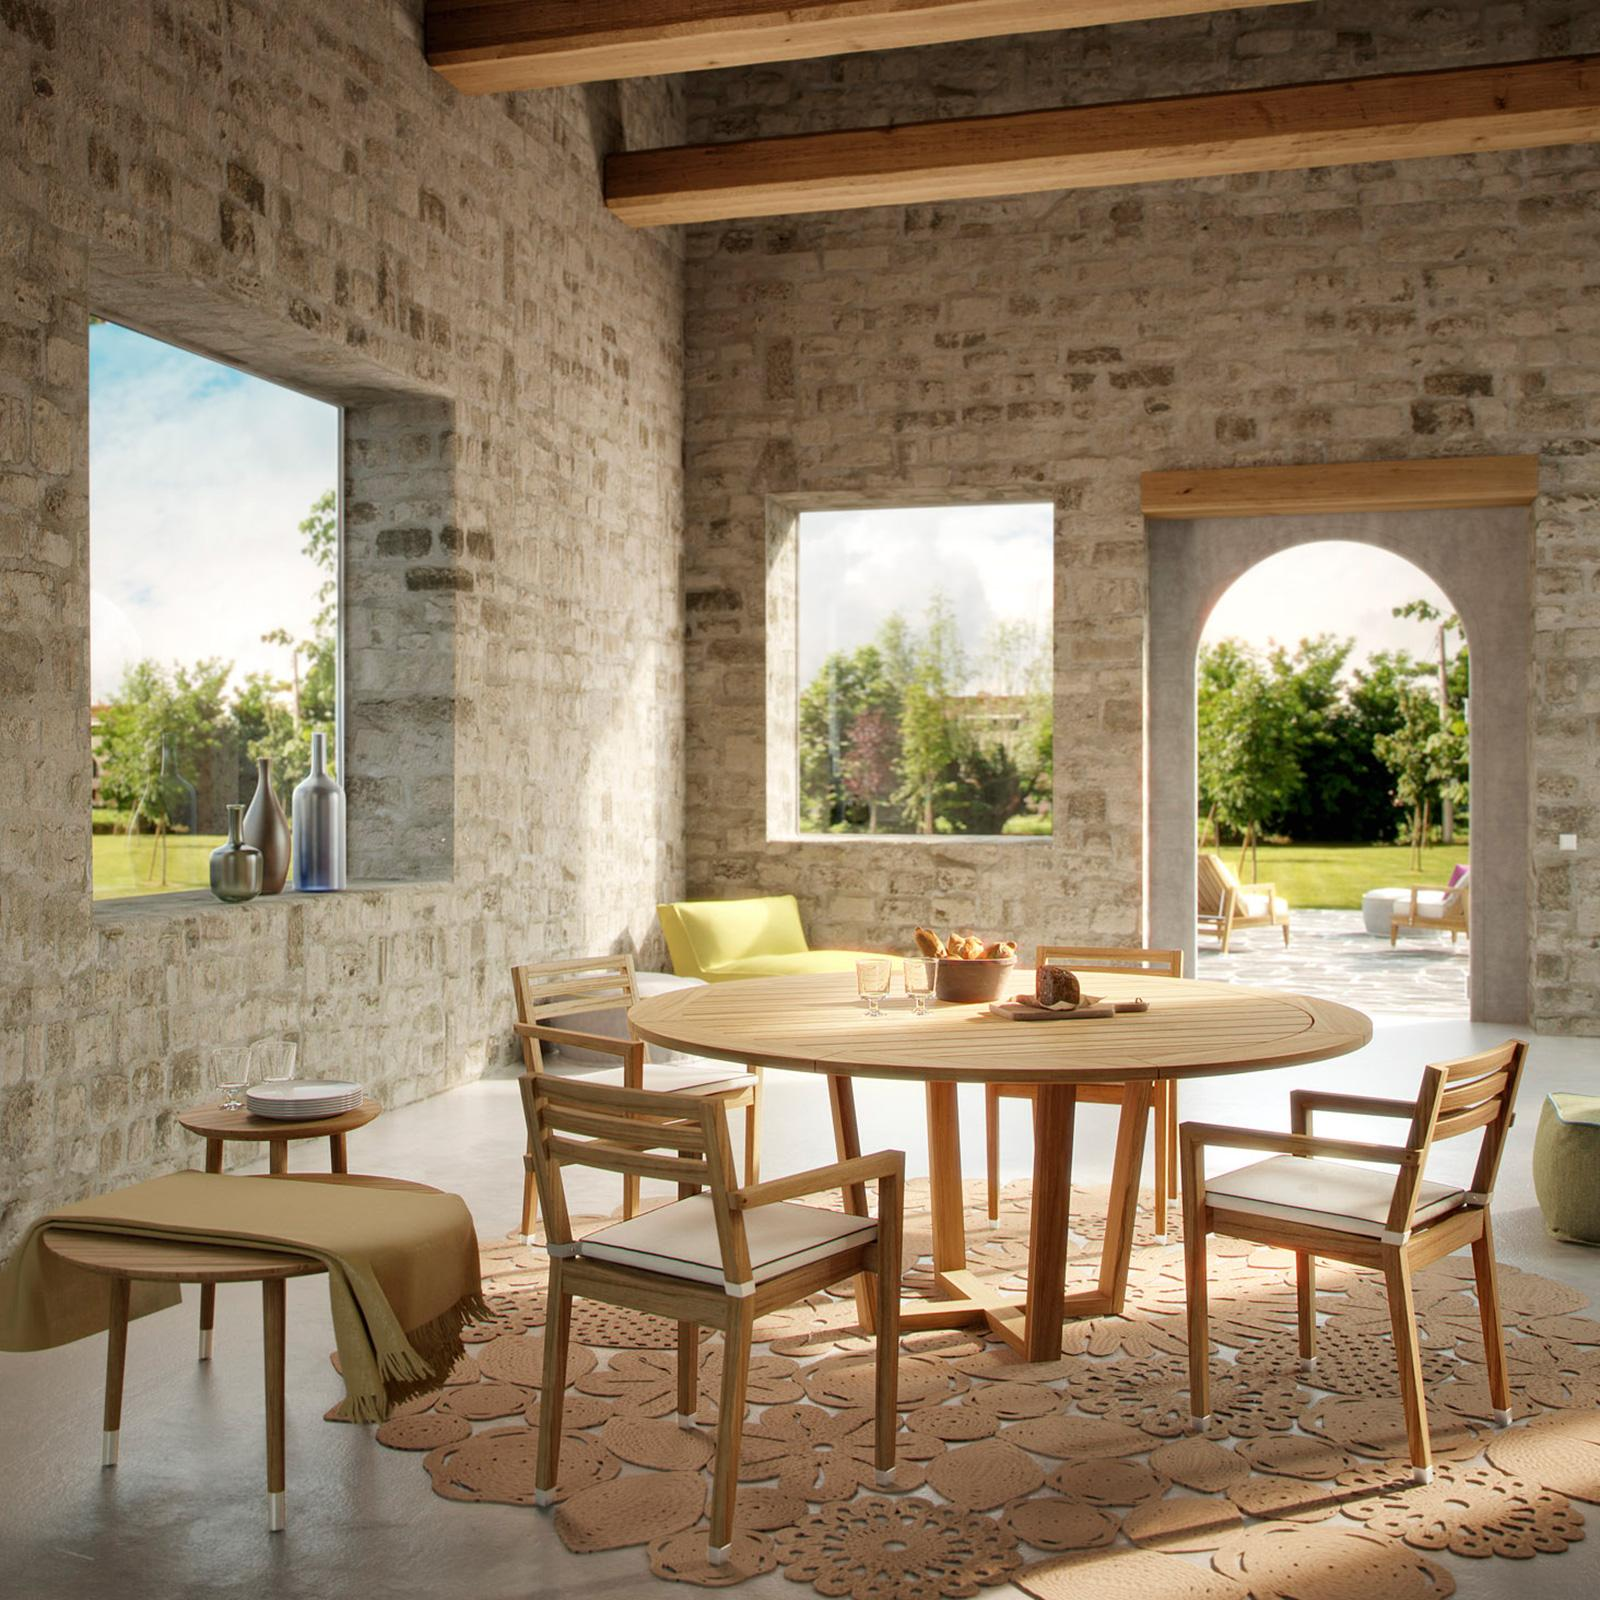 Sahara Tavolo Rotondo Da Esterno In Teak Italy Dream Design